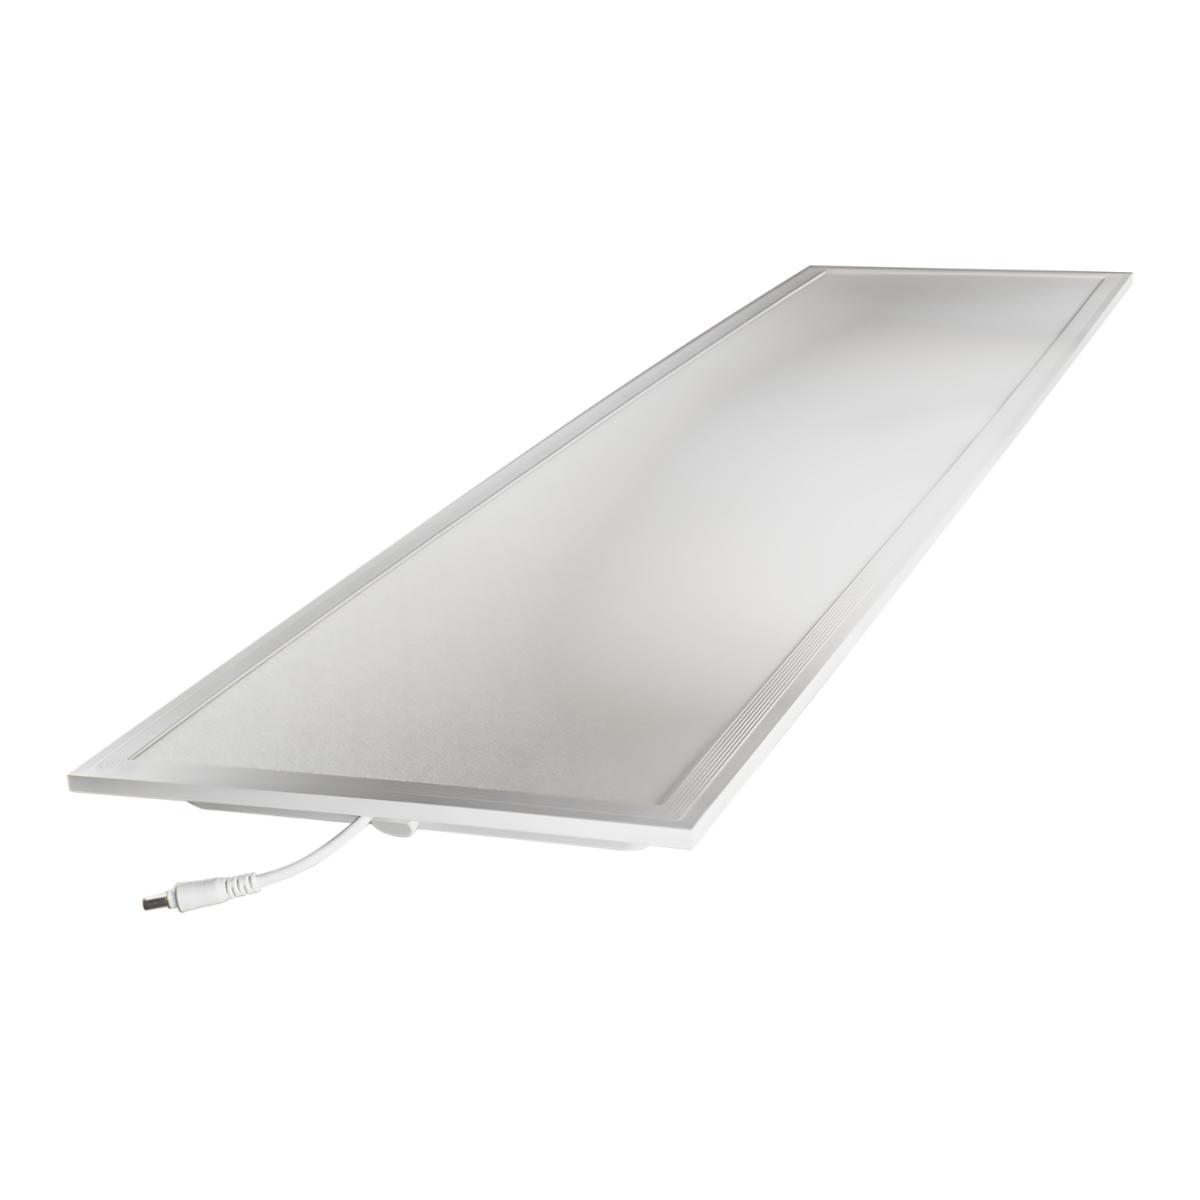 Noxion LED Paneel Econox 32W 30x120cm 4000K 4400lm UGR <22 | Koel Wit - Vervangt 2x36W